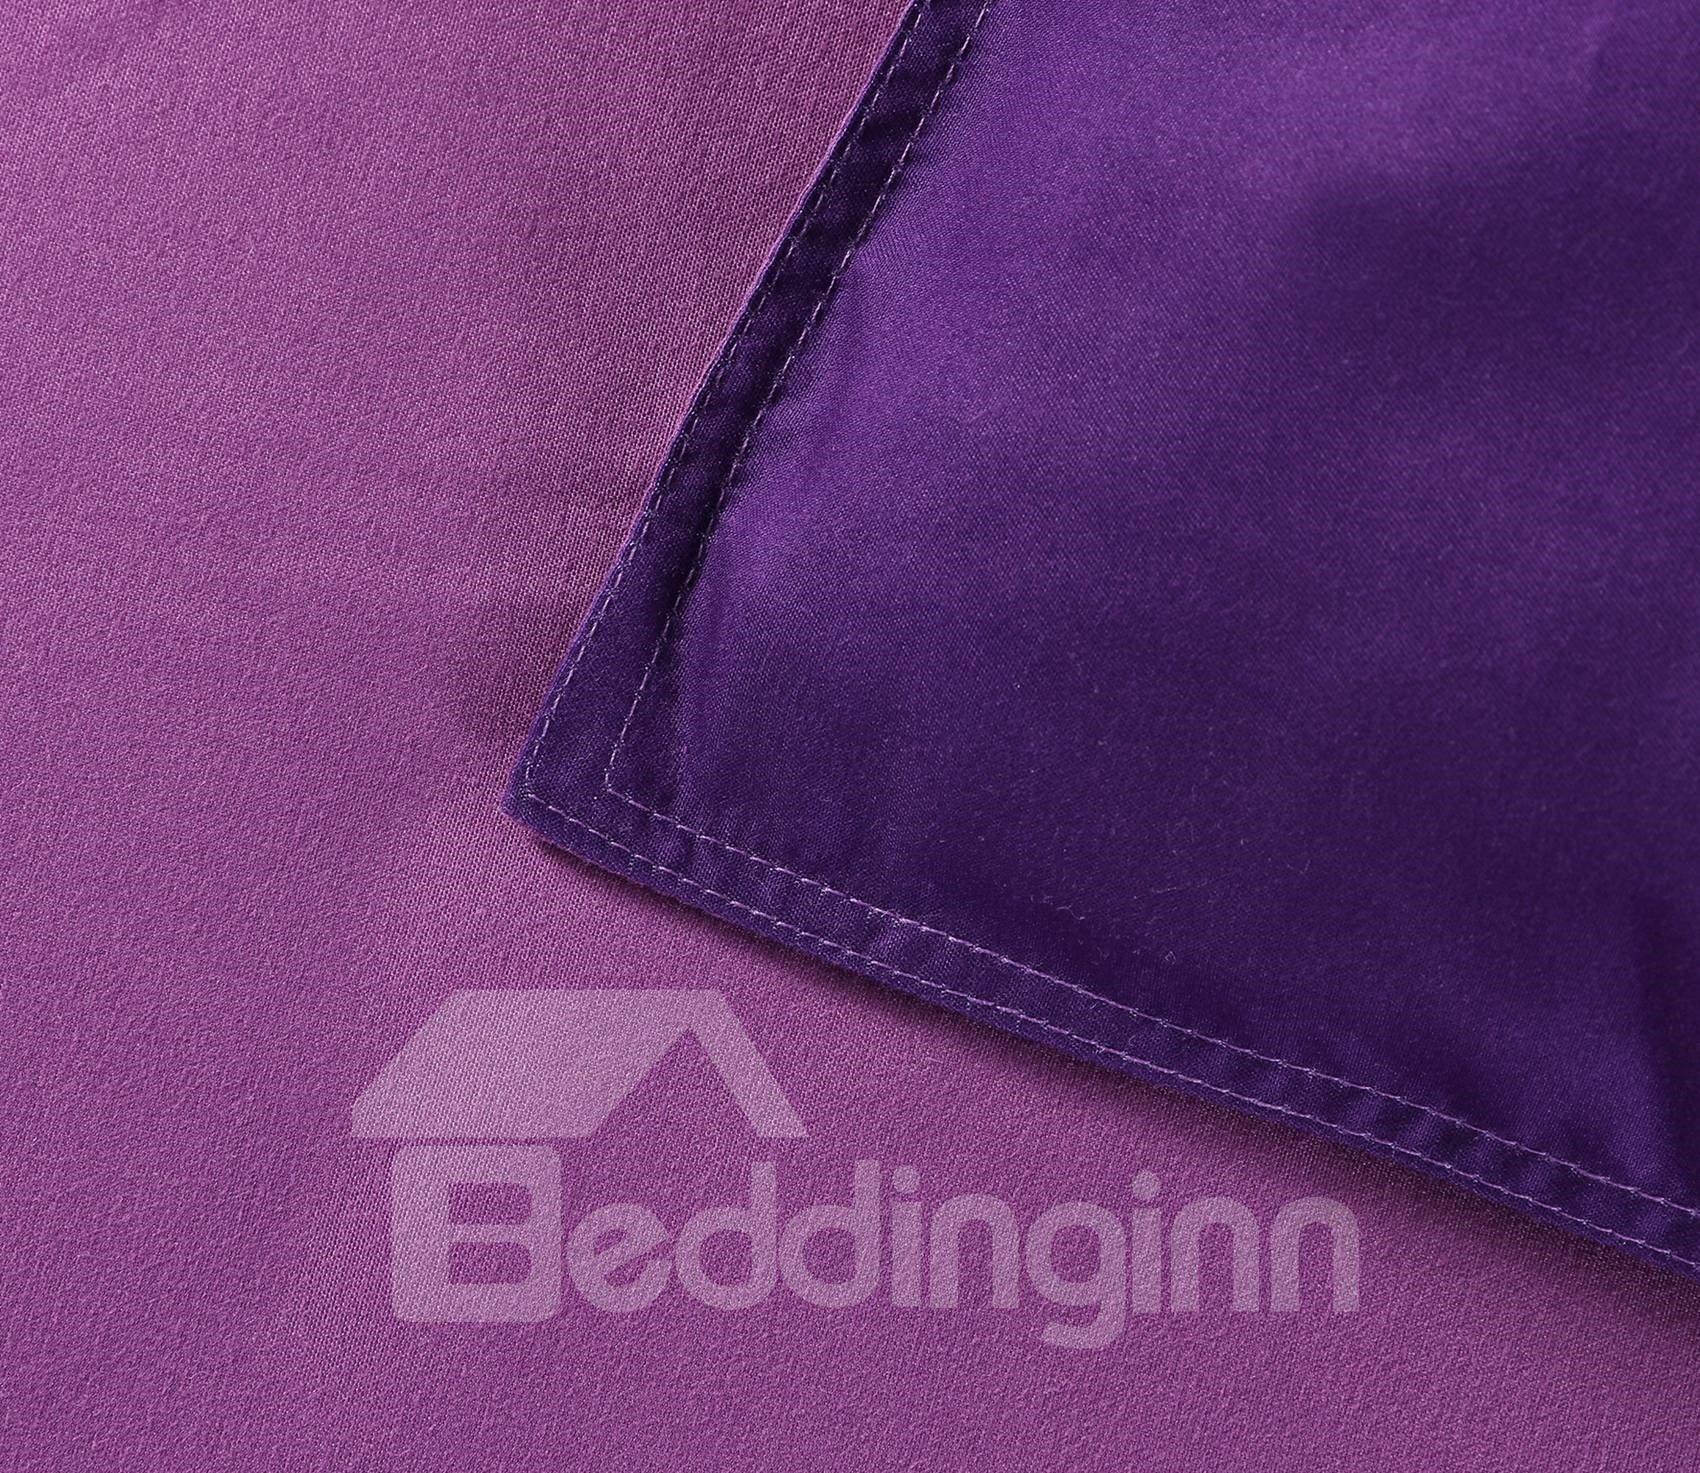 Purple Unicorn Printed Cotton All Season 3D 4-Piece Bedding Sets/Duvet Covers